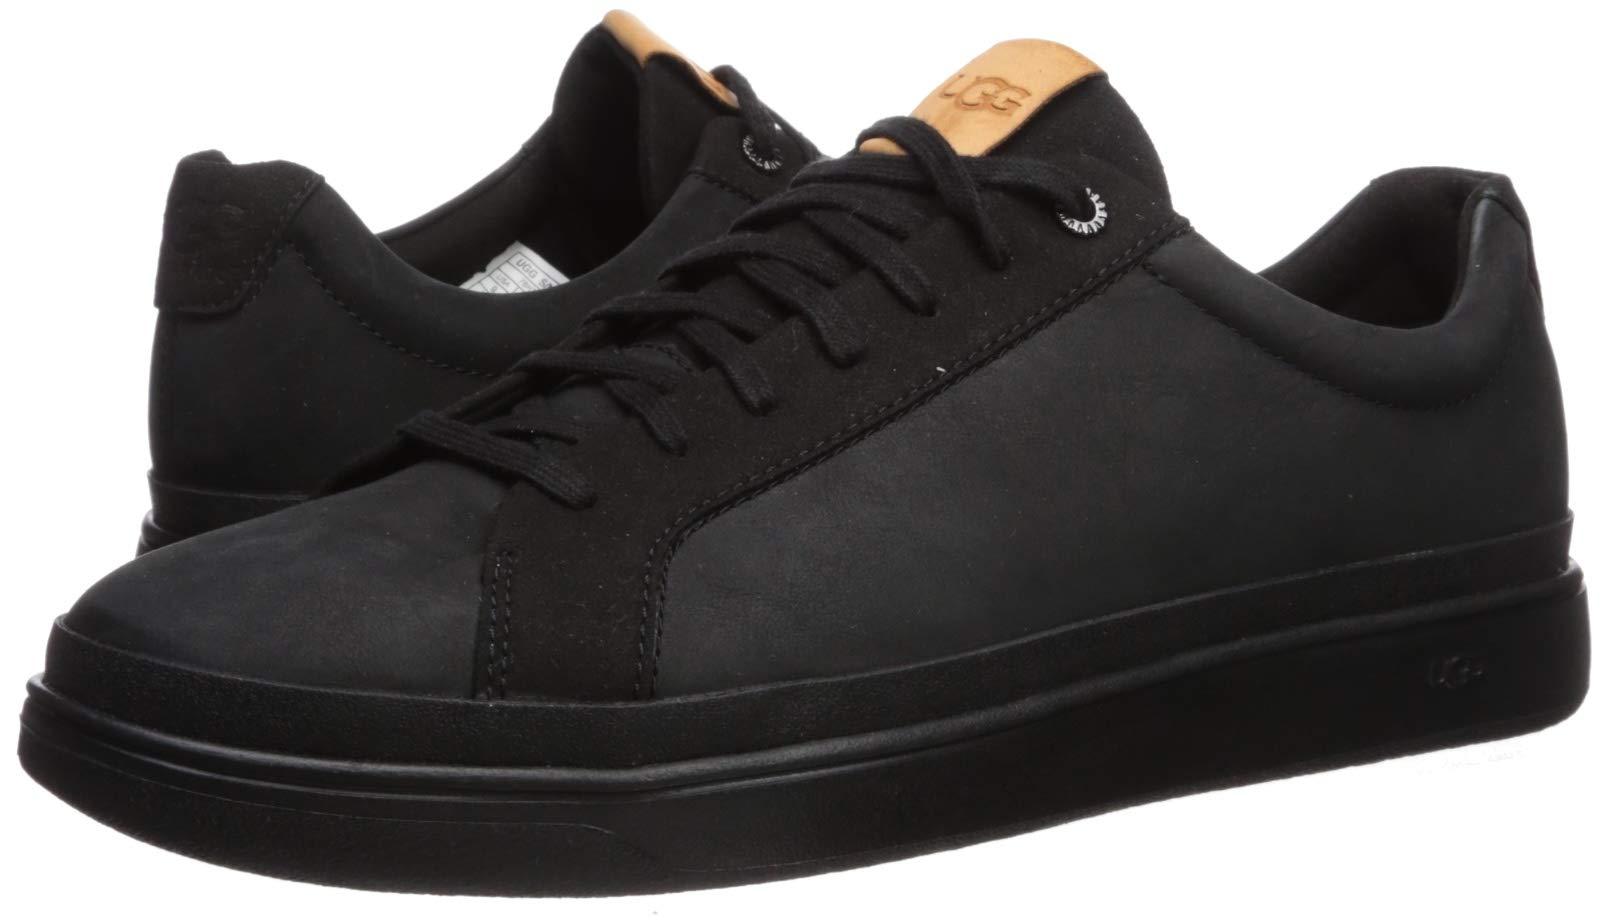 UGG Men's Cali Sneaker Low Waterproof